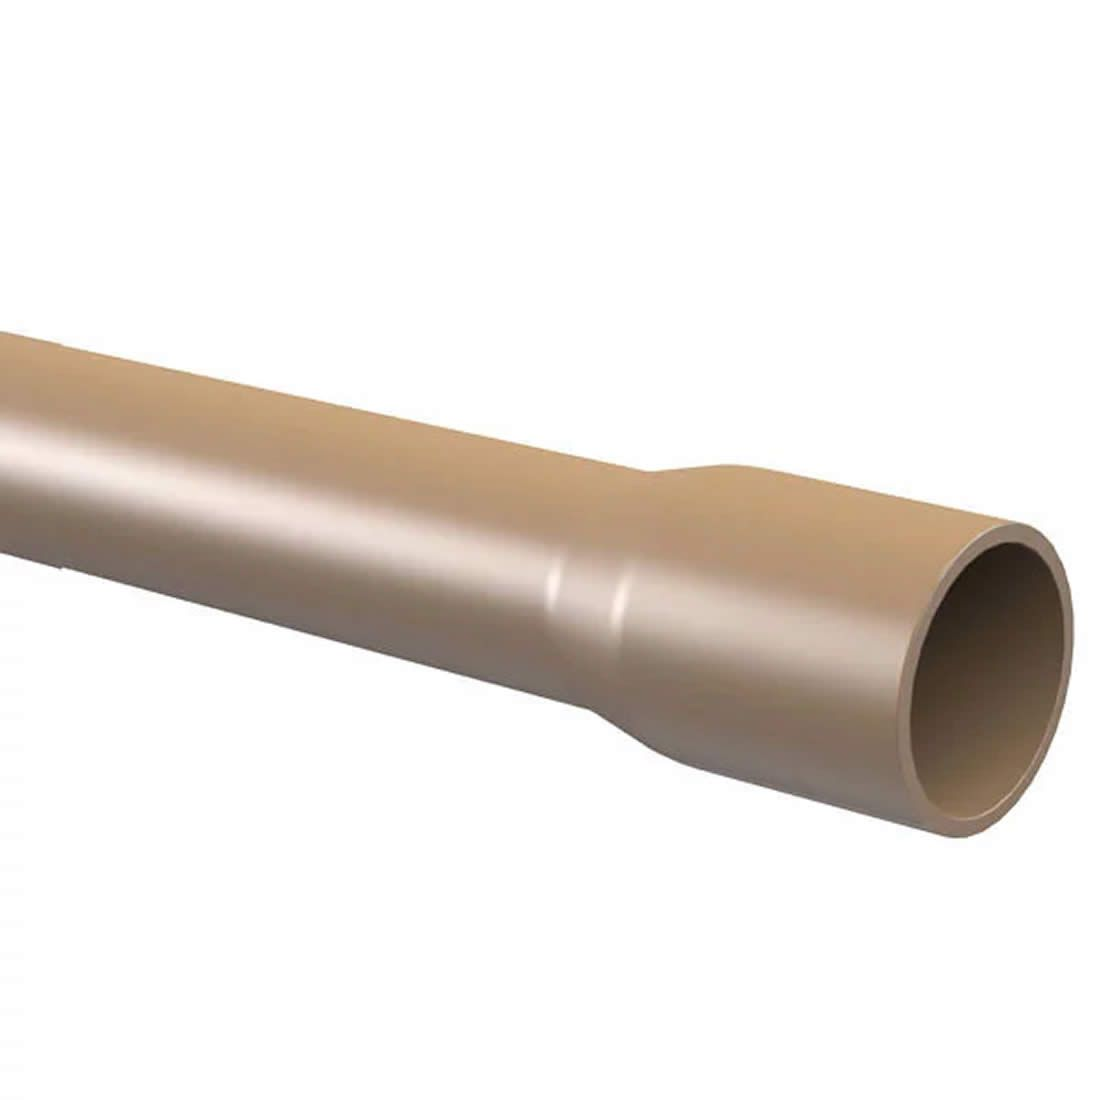 Tubo PVC Soldável 110mm X 6 Metros Tigre